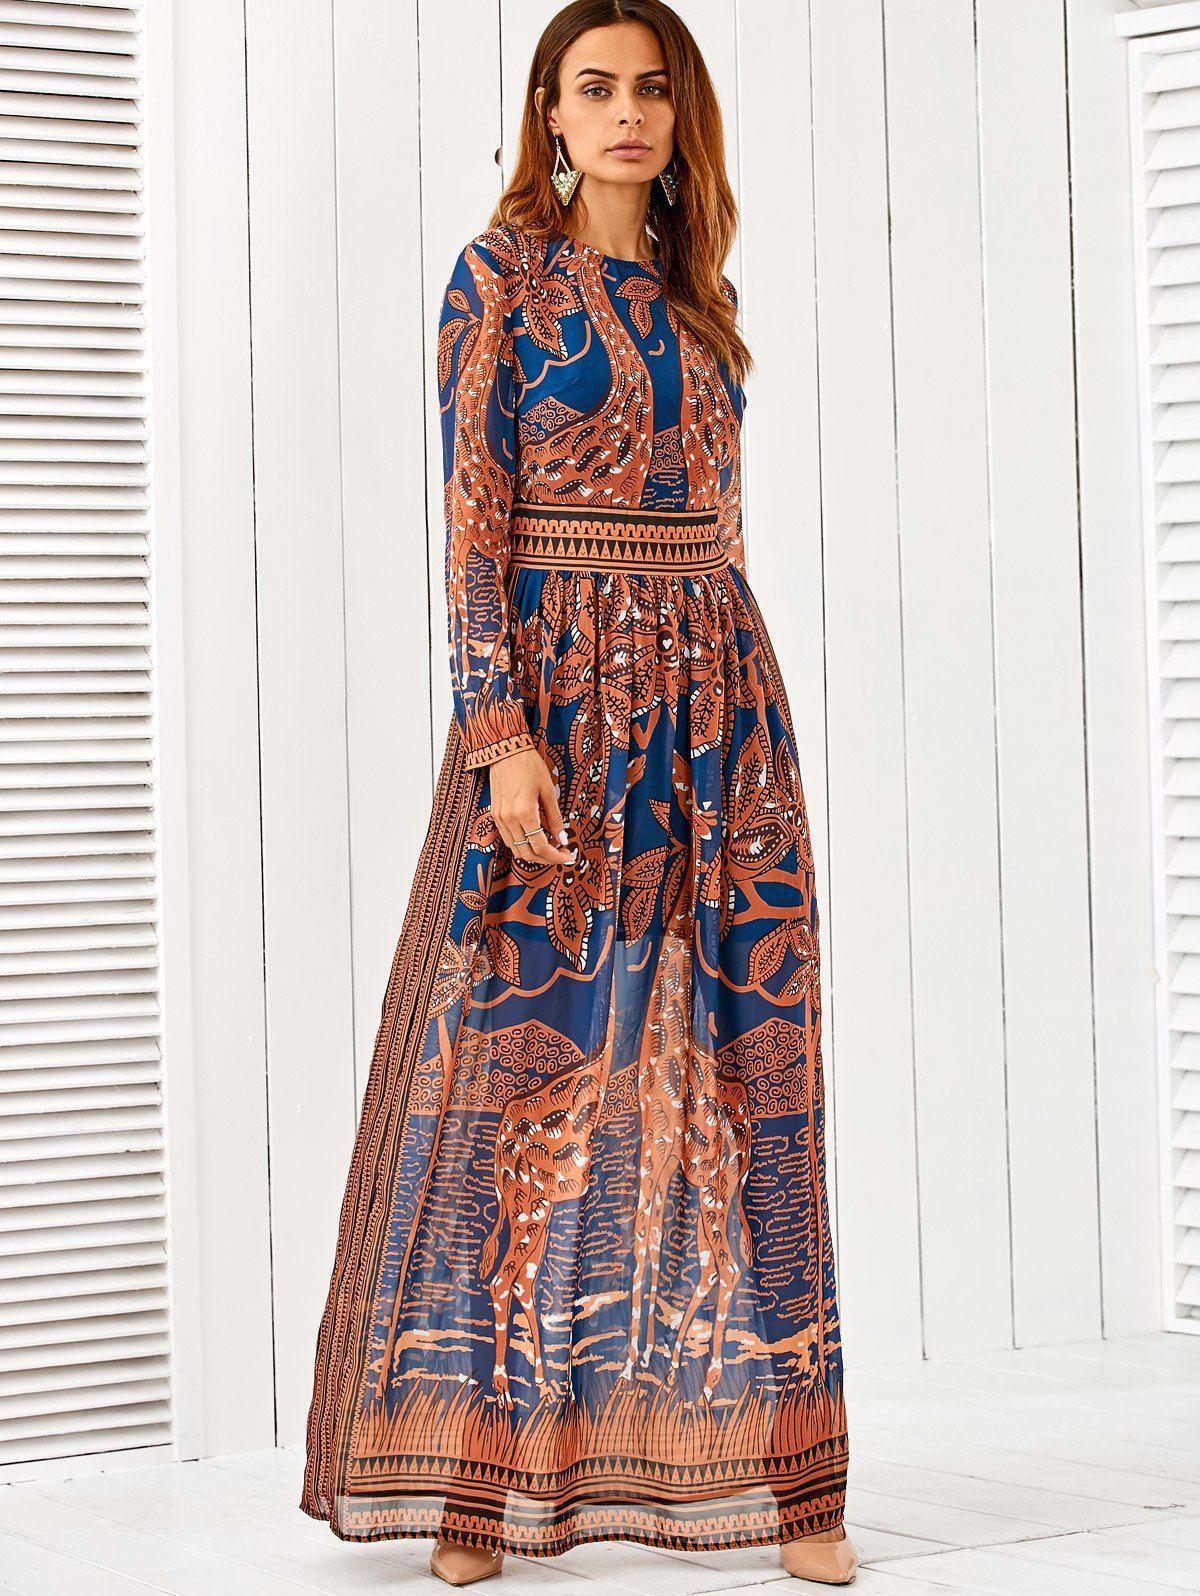 Giraffes Print Vintage Maxi Dress BLUE: Maxi Dresses | ZAFUL